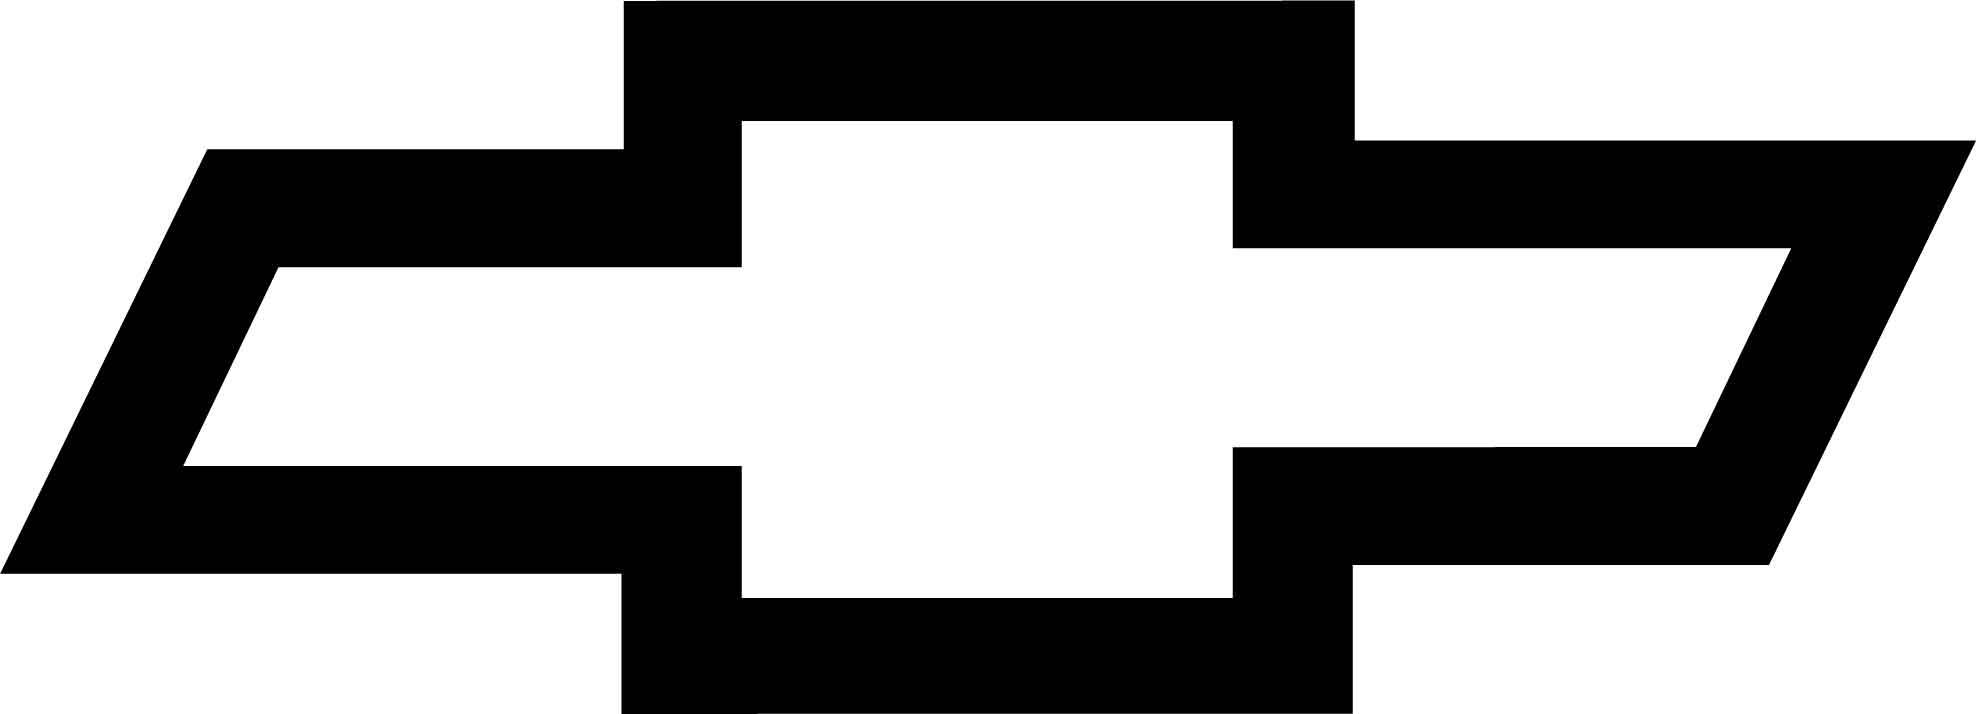 Chevrolet Logo Clipart.